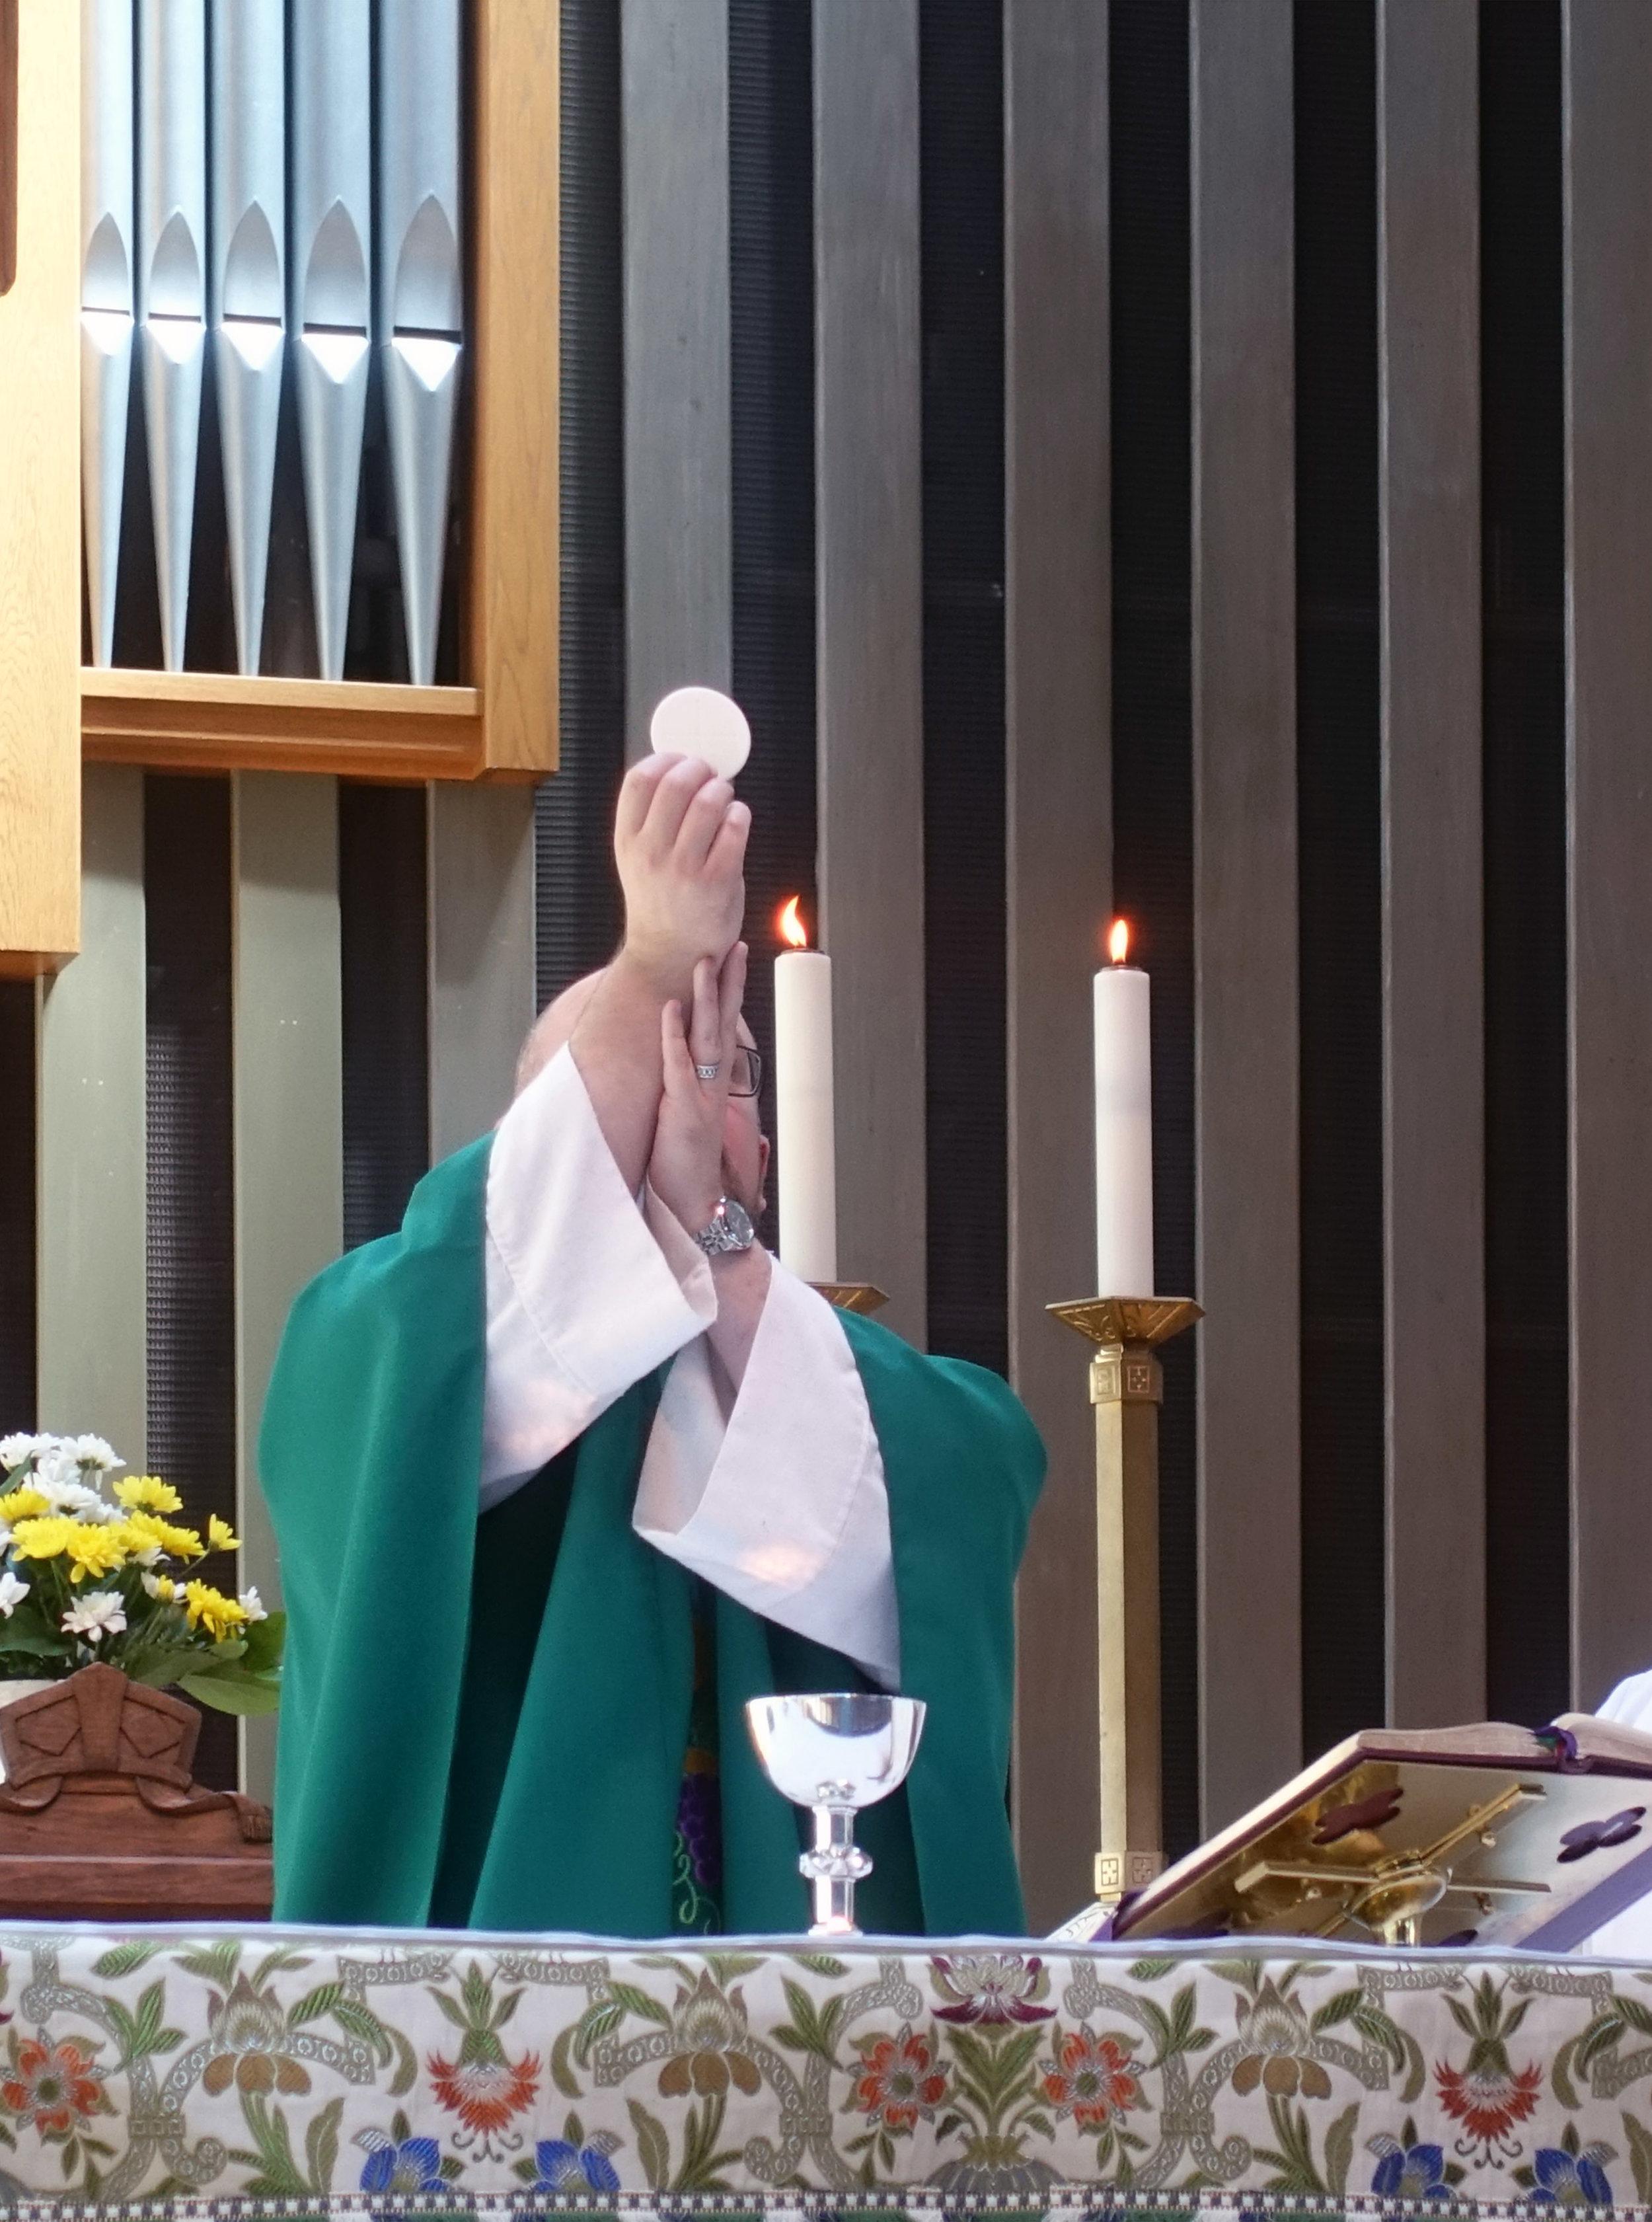 Eucharist/Holy Communion